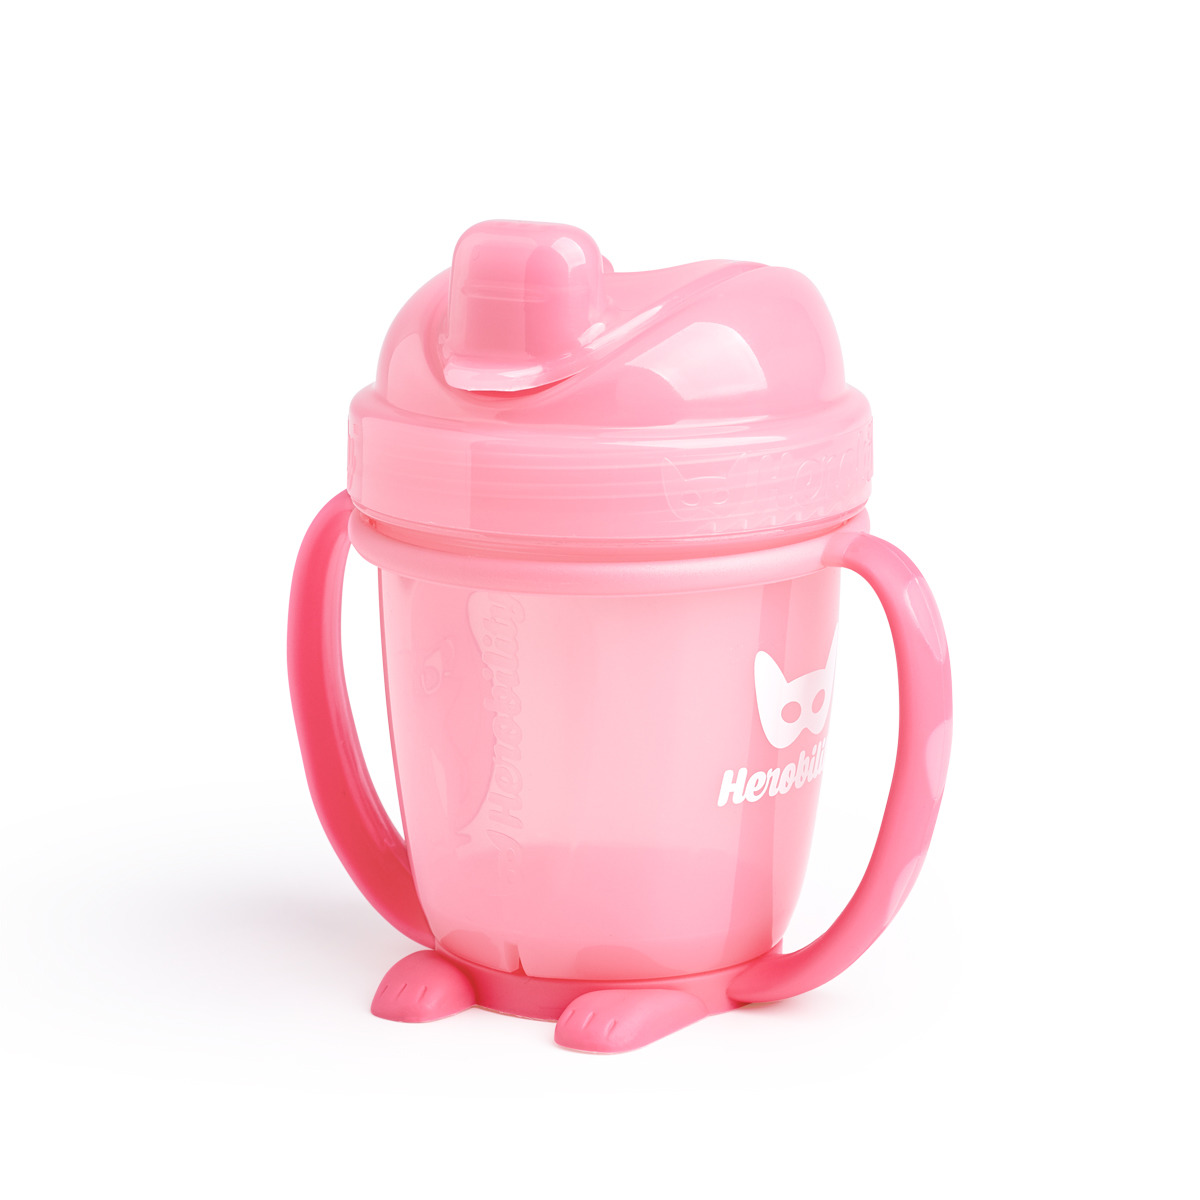 Herobility – kubek niekapek HeroSippy 140 ml, różowy